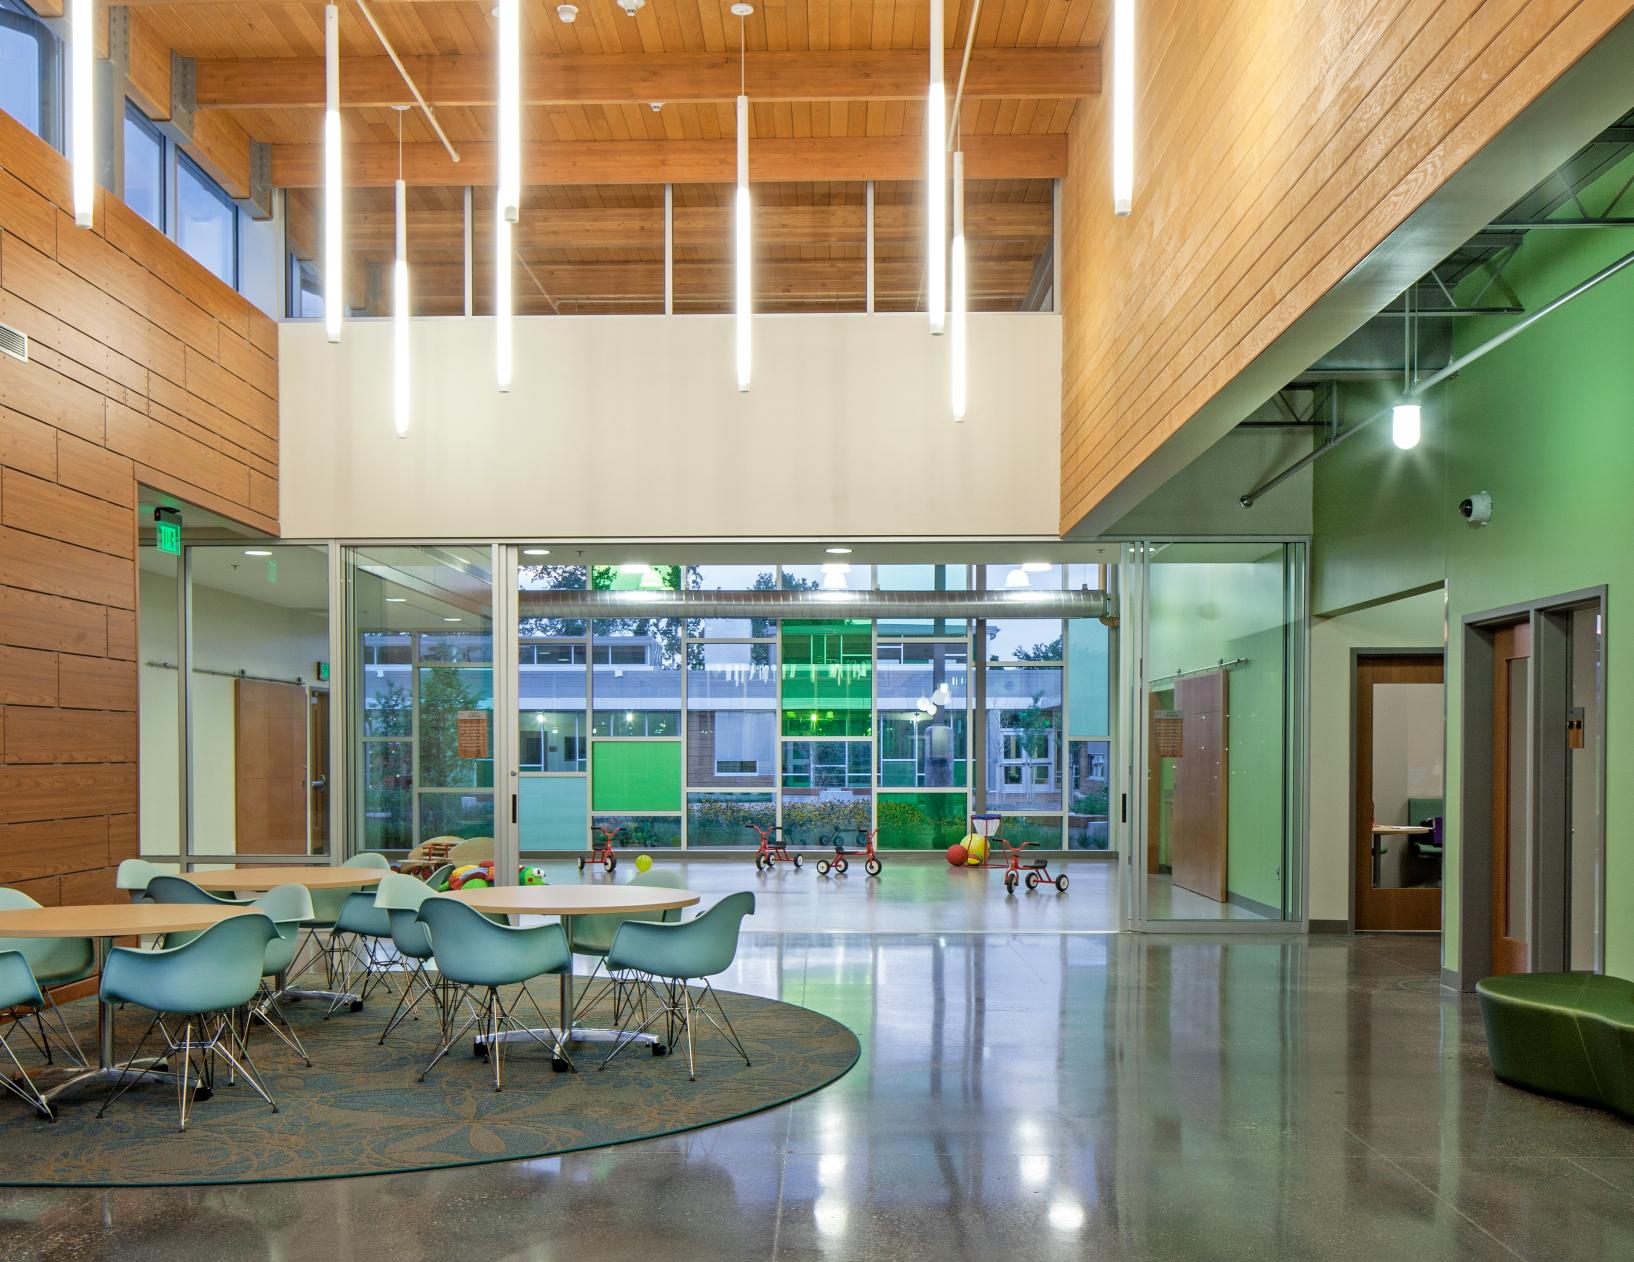 Lincoln, DC-Educare schools honored for design